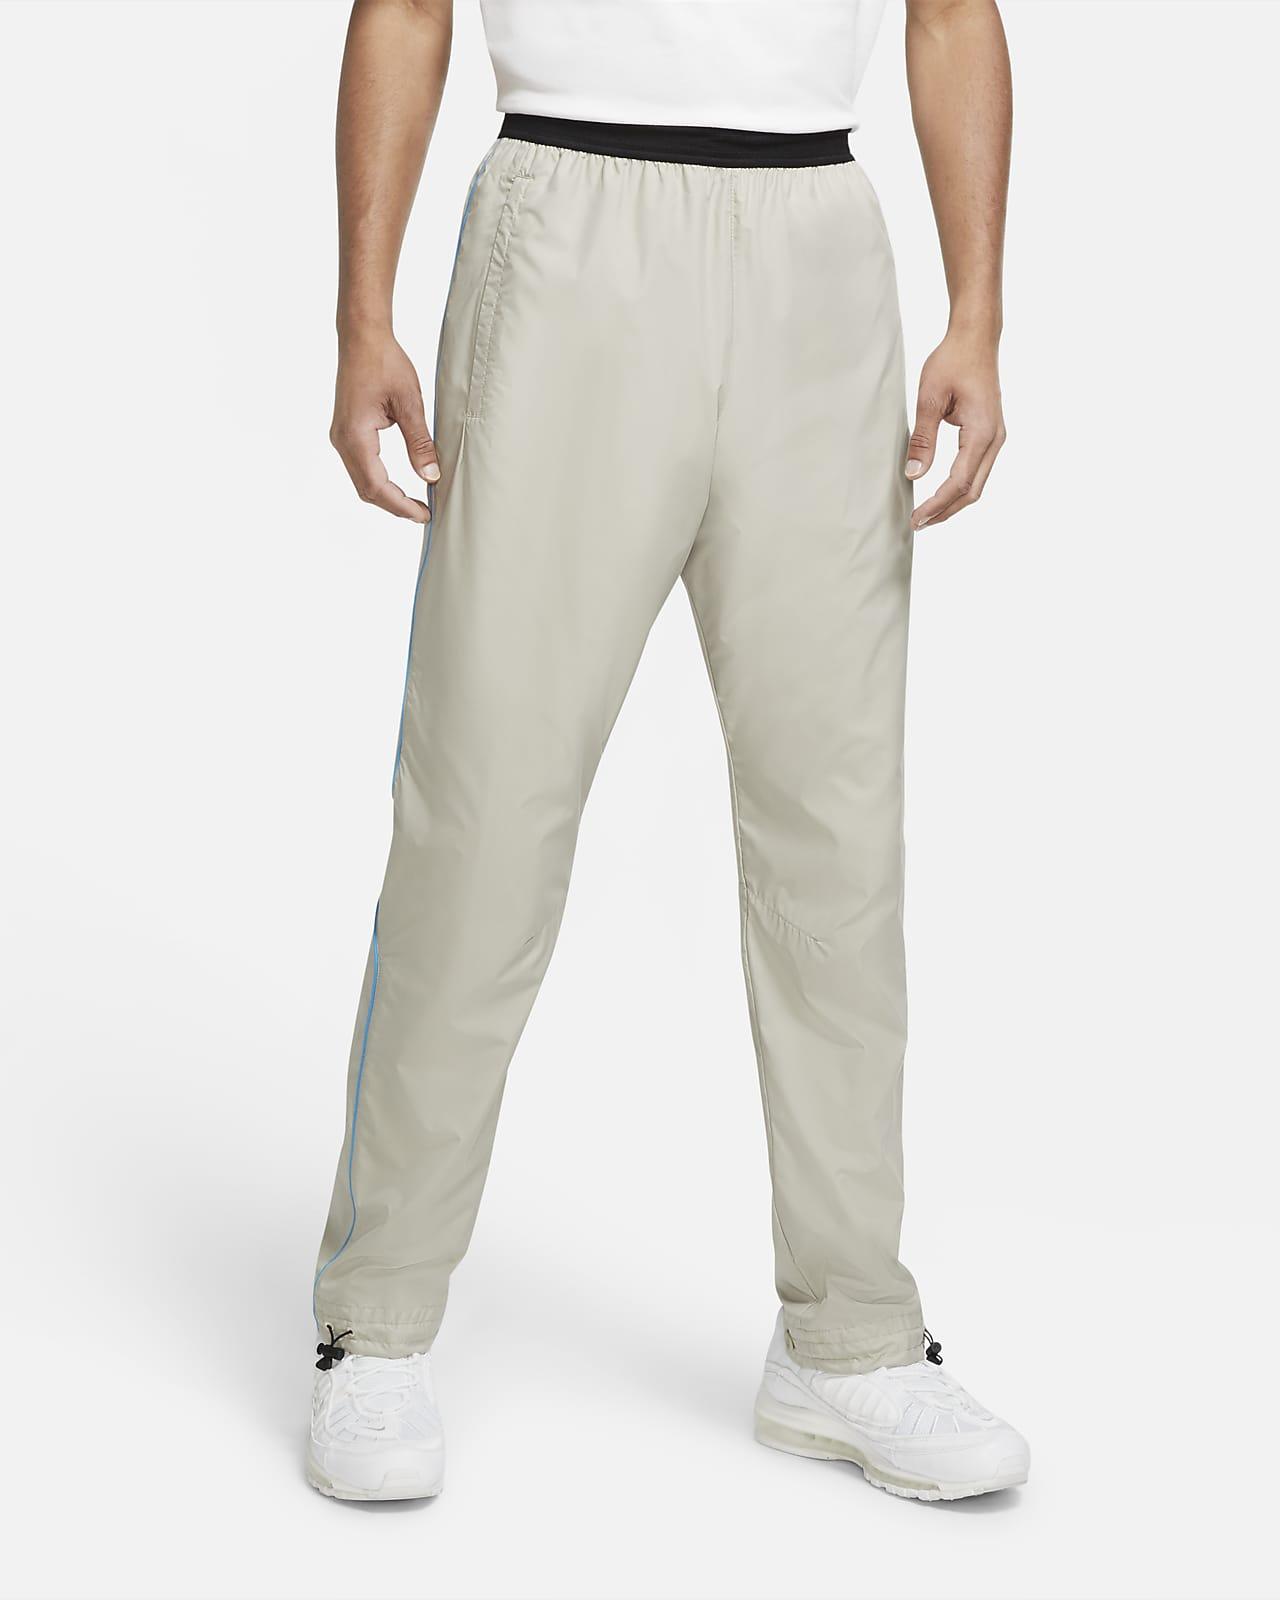 Pantalones de tejido Woven para hombre Nike Sportswear